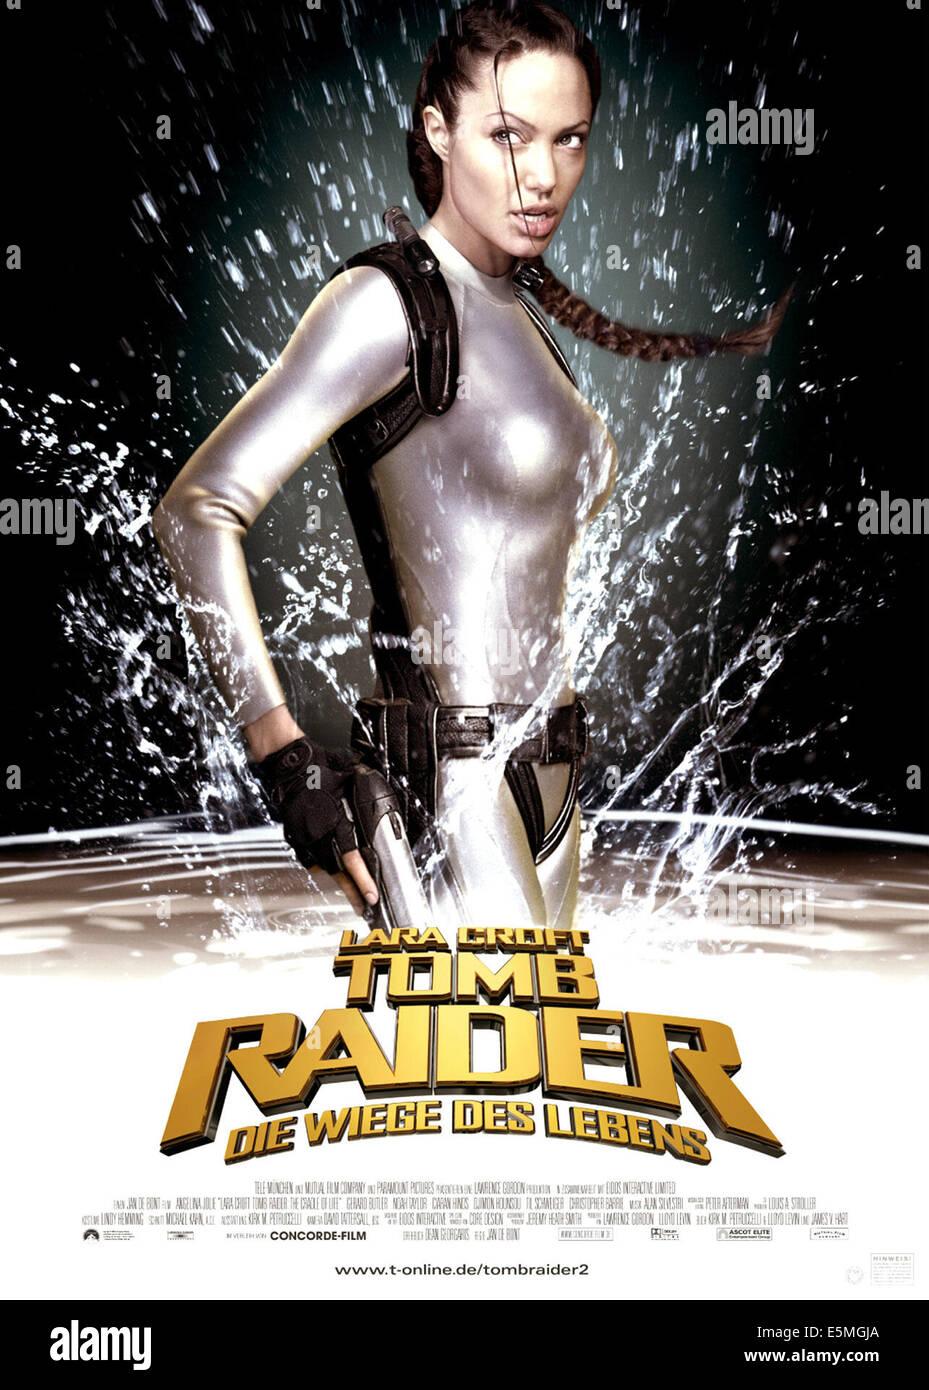 LARA CROFT TOMB RAIDER: THE CRADLE OF LIFE, Angelina Jolie, 2003, (c) Paramount/courtesy Everett Collection - Stock Image